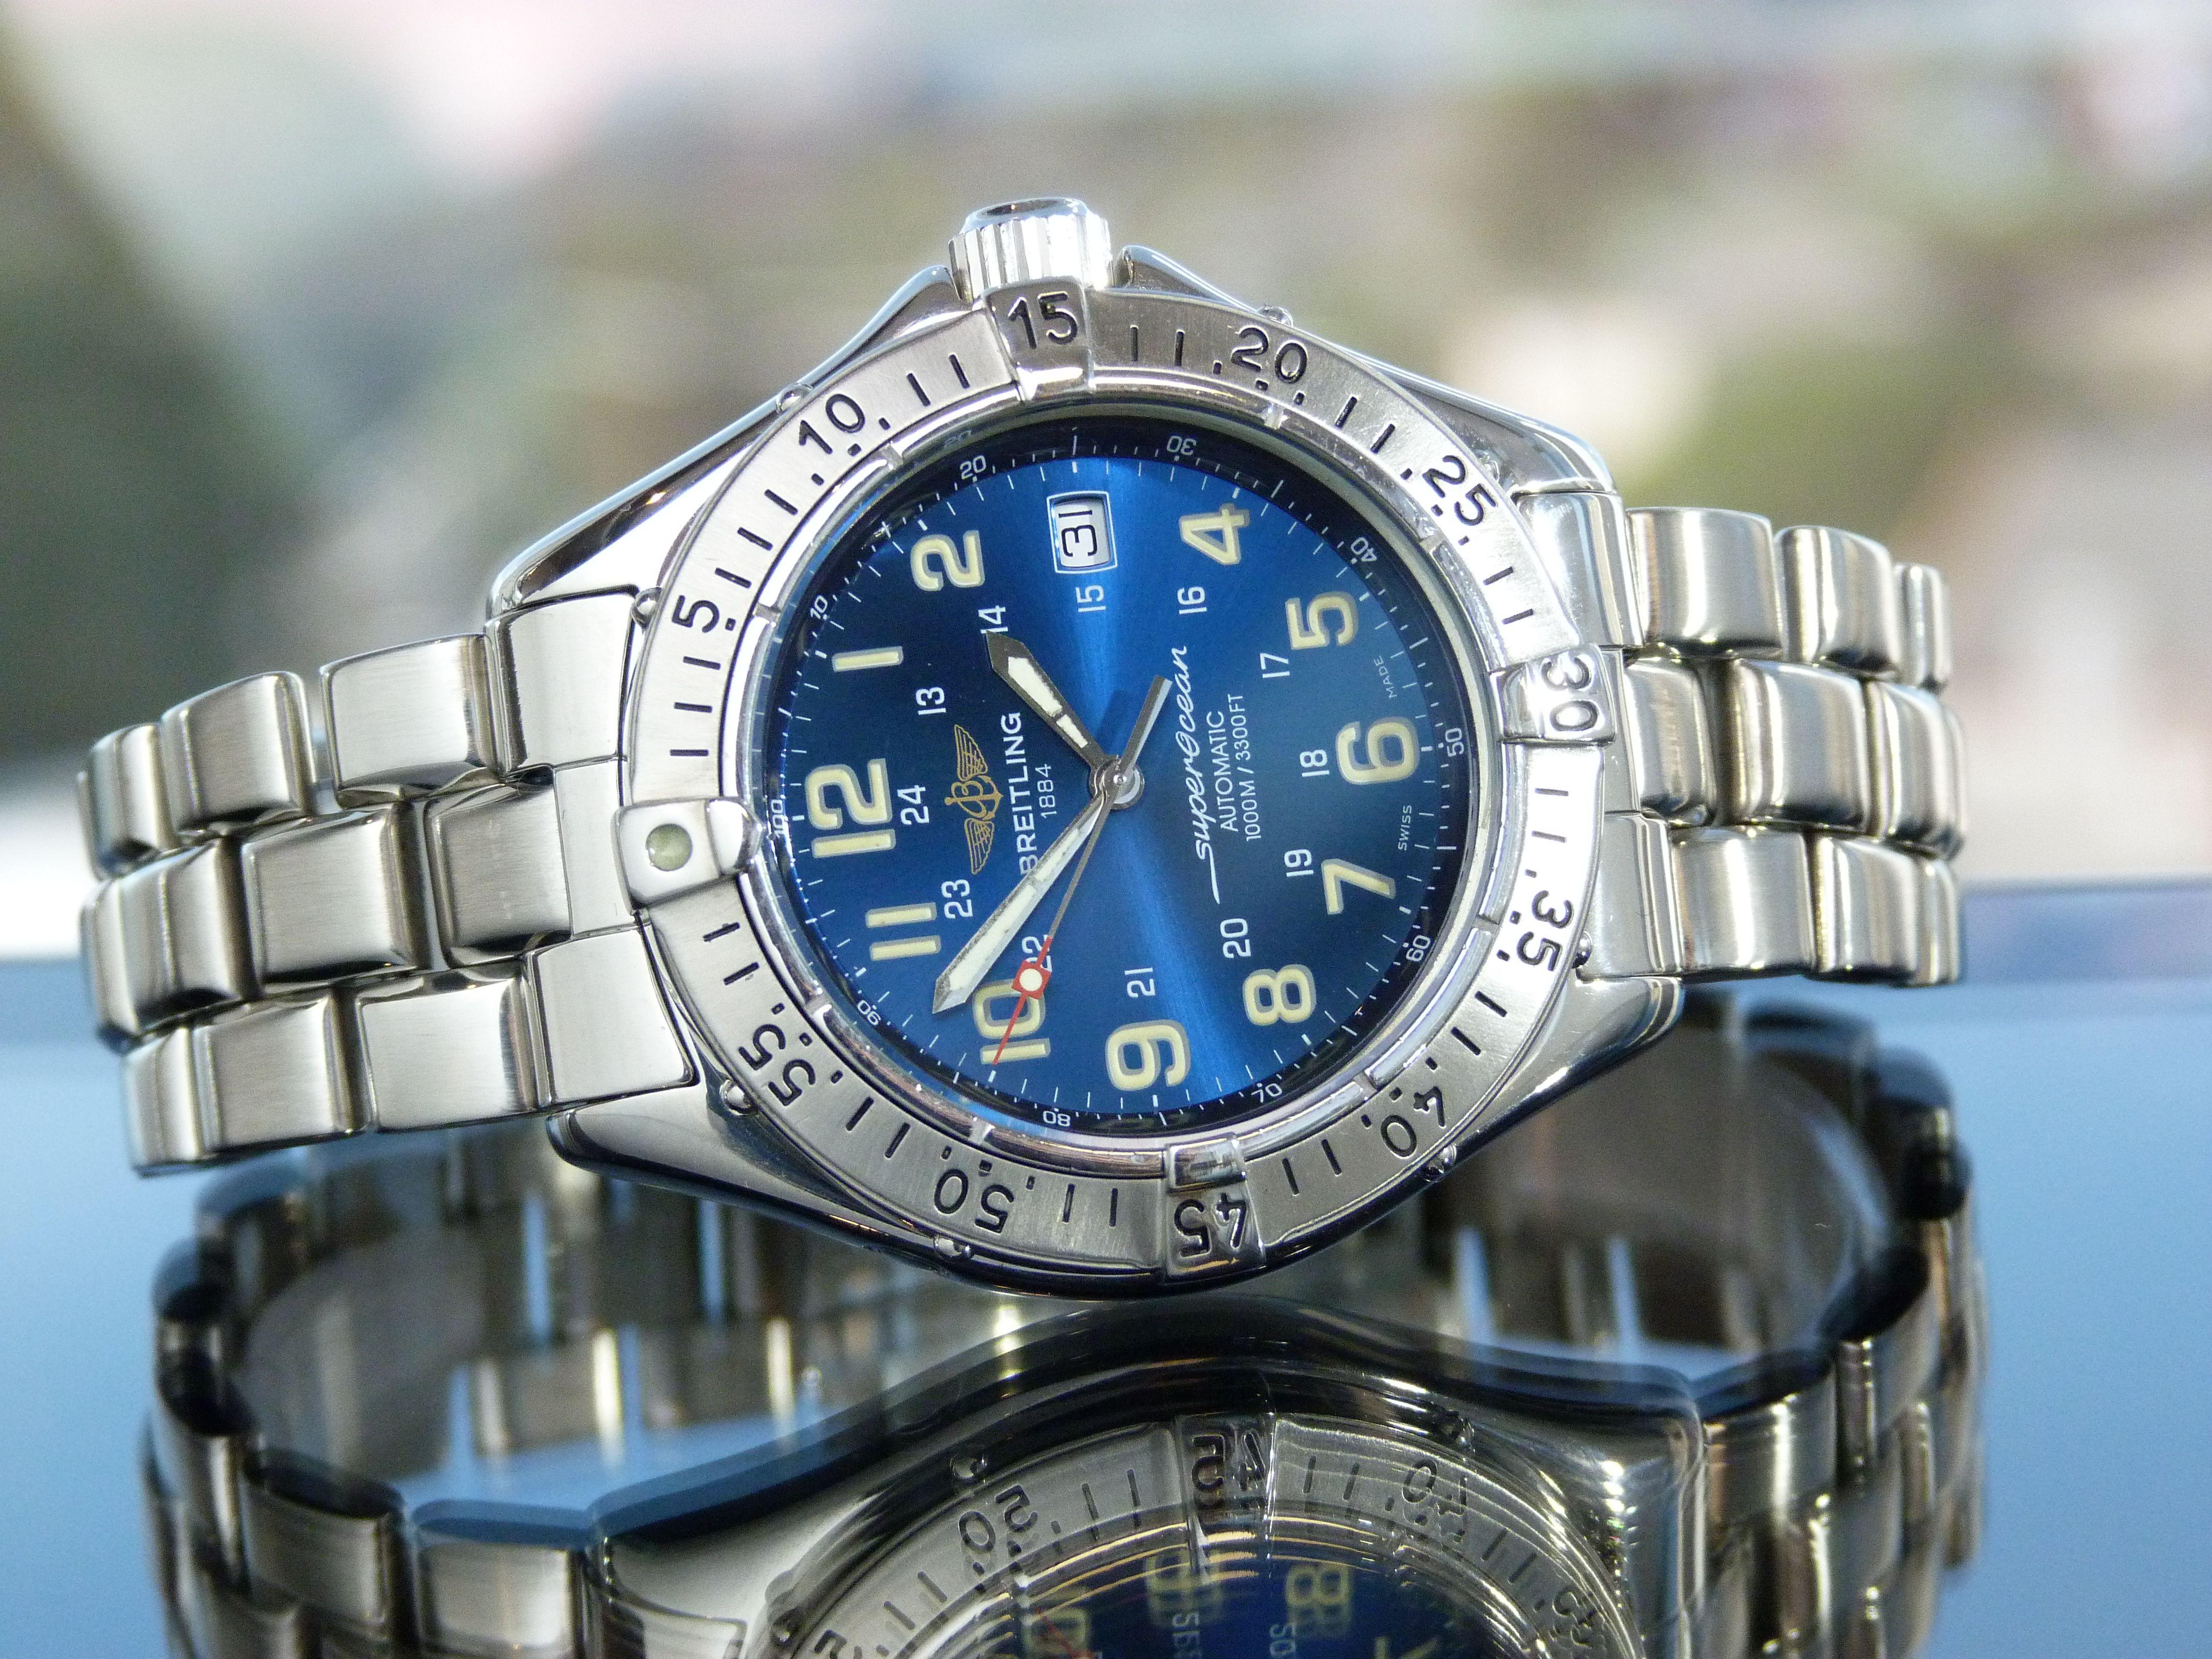 59549815794 Breitling Superocean 1000m Automático Ref.  A17040  breitlingwatches   breitling  watchtrade